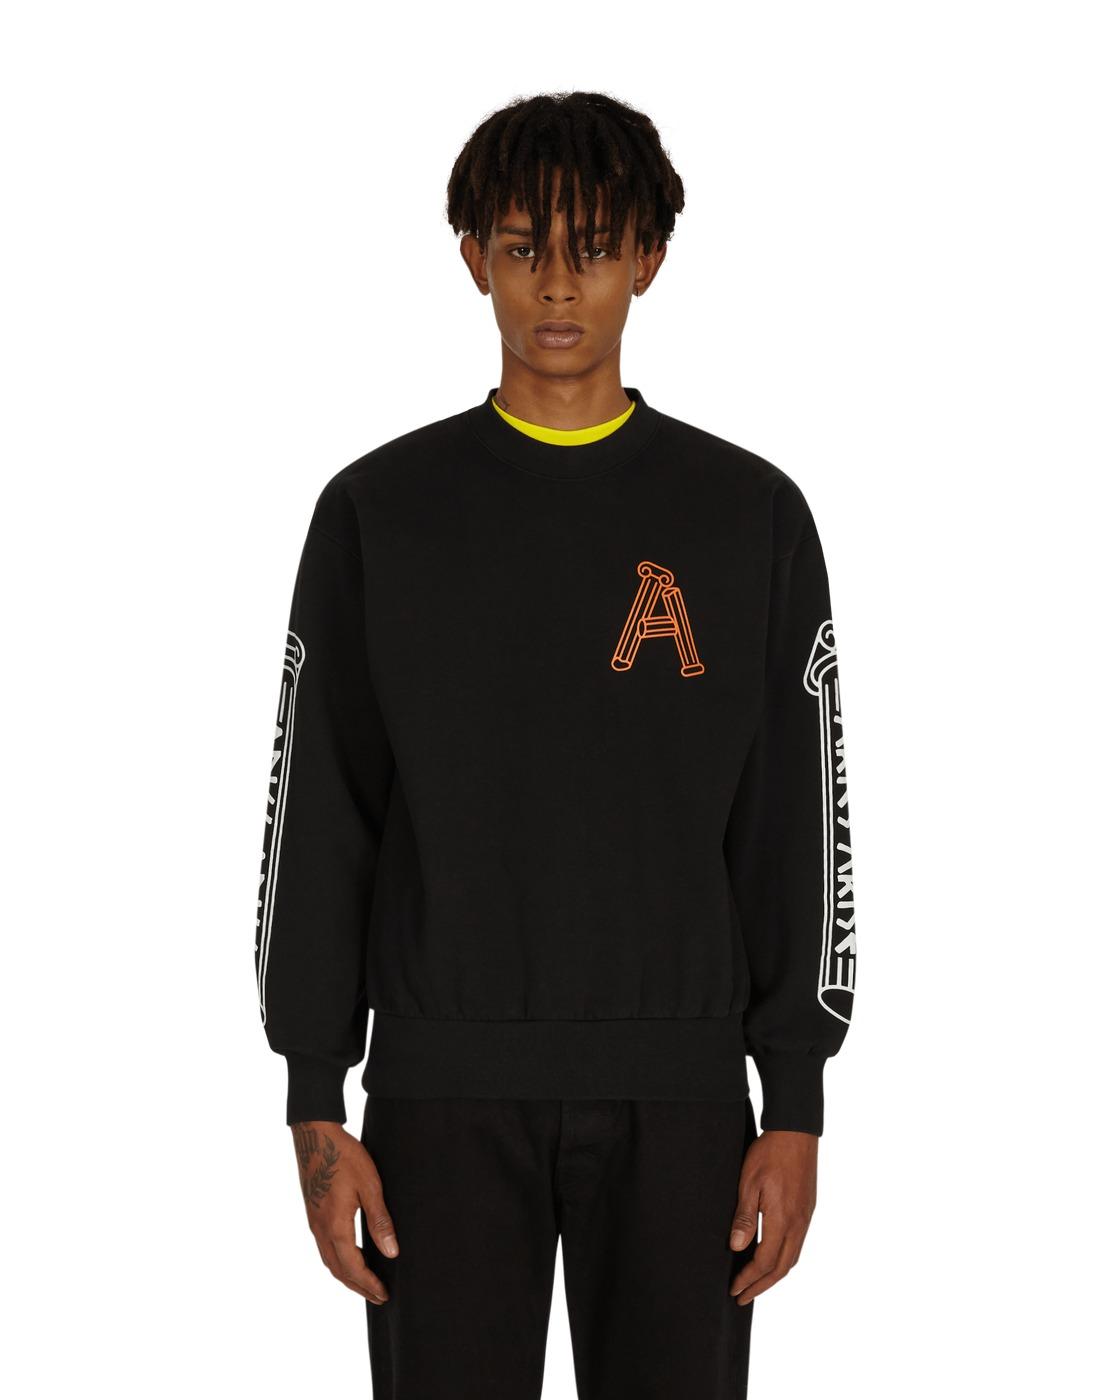 Aries Greek Column Crewneck Sweatshirt Black